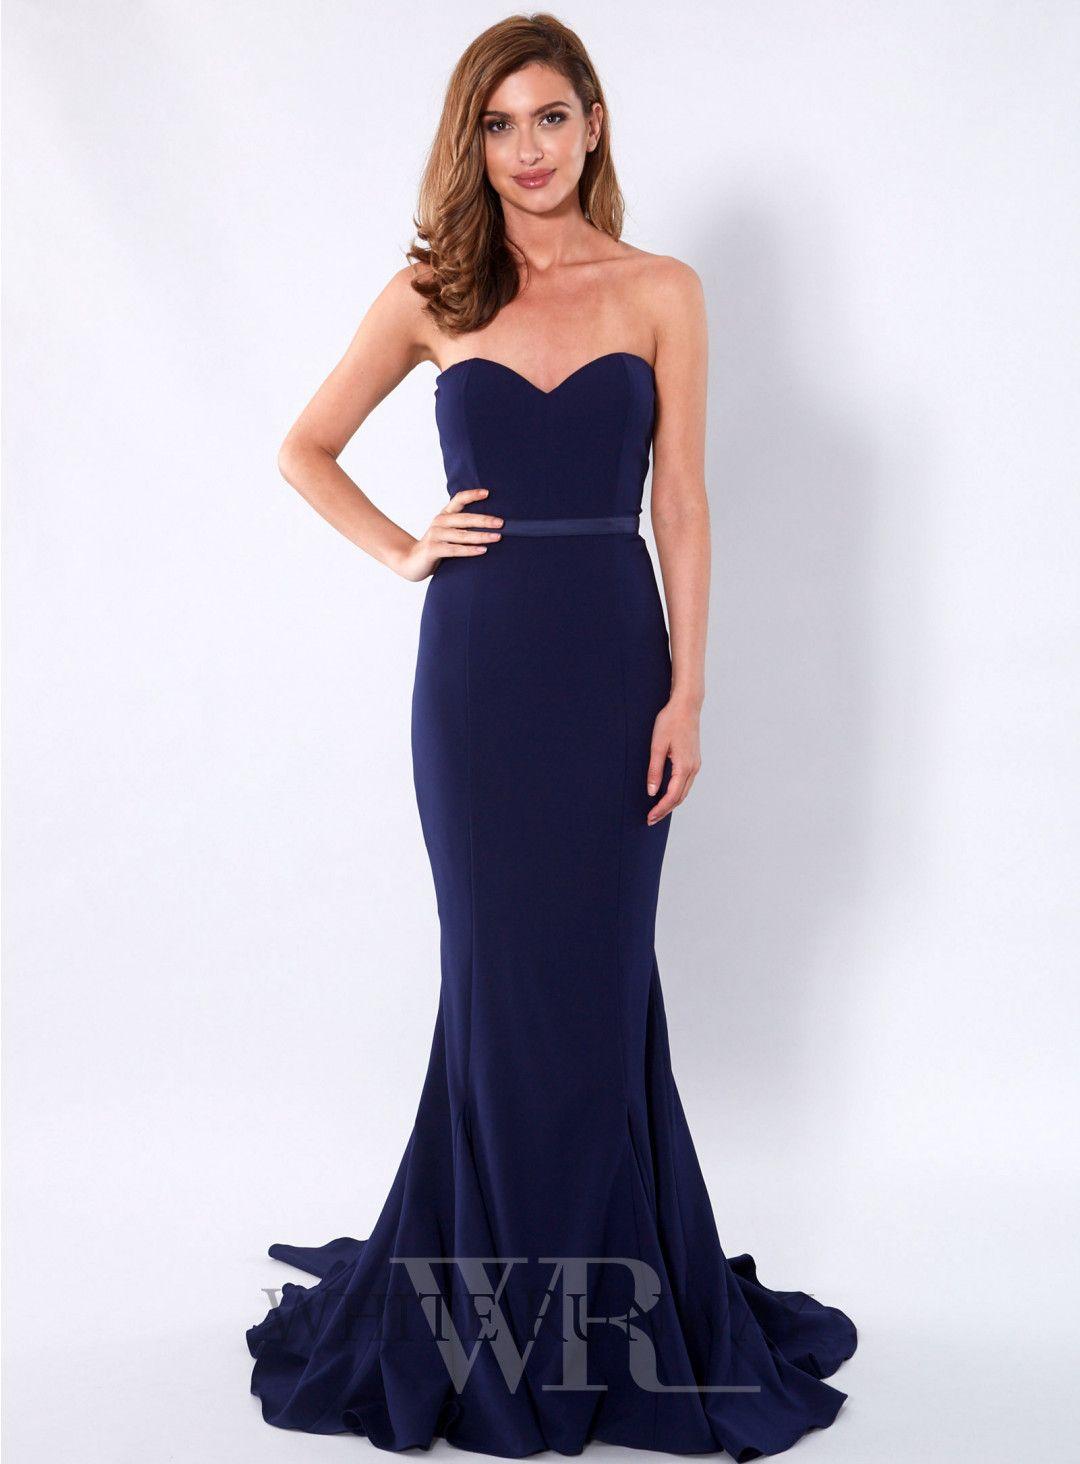 Navy arianna dress an elegant floor length gown by elle zeitoune a